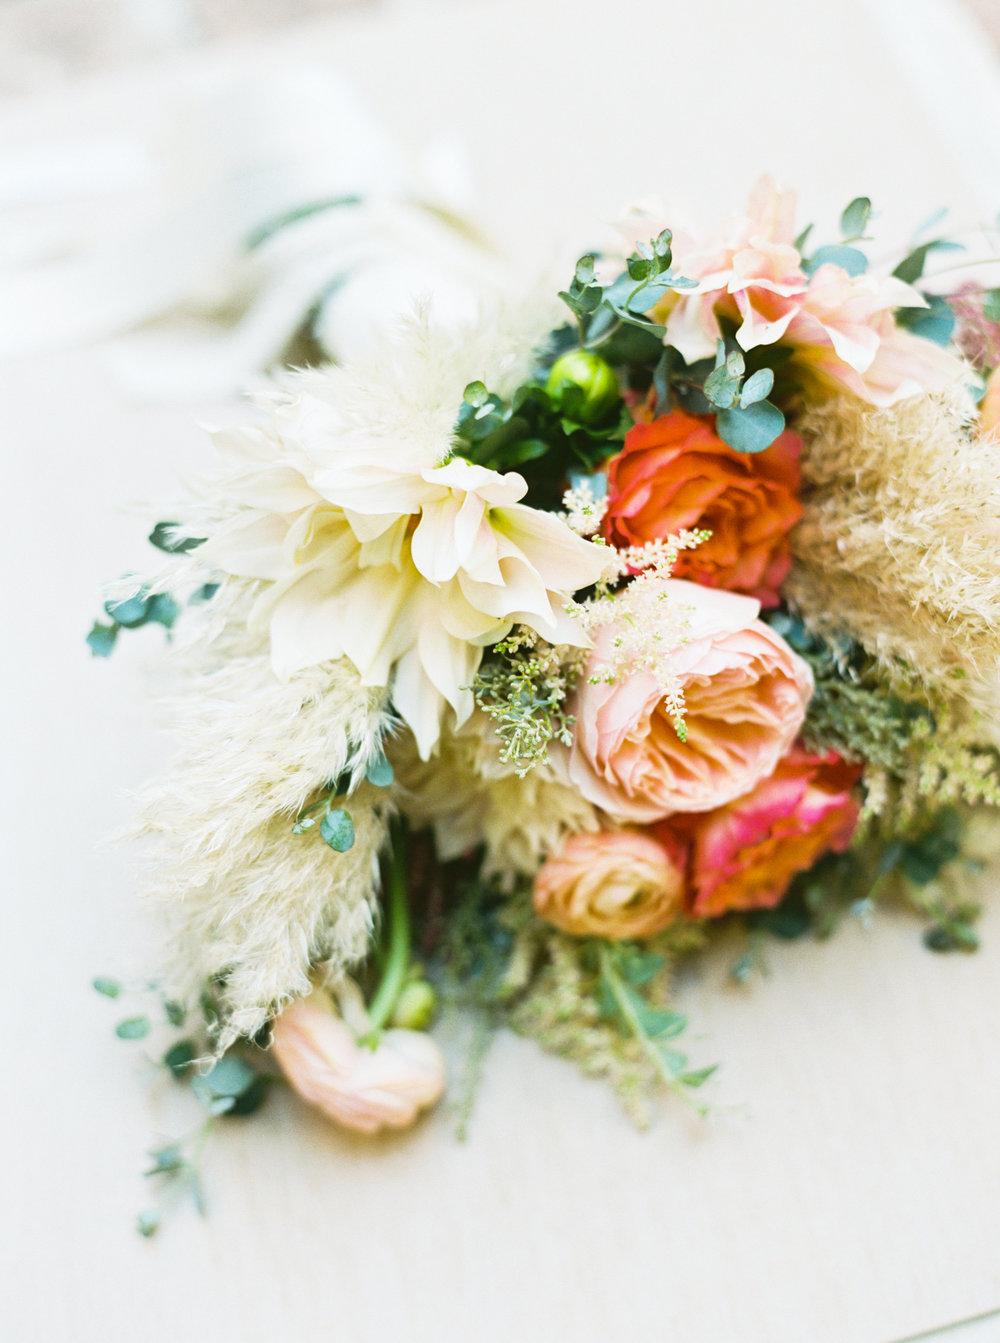 Modern BoHo Desert Garden Wedding: Jocelyn & Tommy- Konsider It Done- AZ Arizona Wedding & Event Planner, Designer, Coordinator Planning in Scottsdale, Phoenix, Paradise Valley, Tempe, Gilbert, Mesa, Chandler, Tucson, Sedona